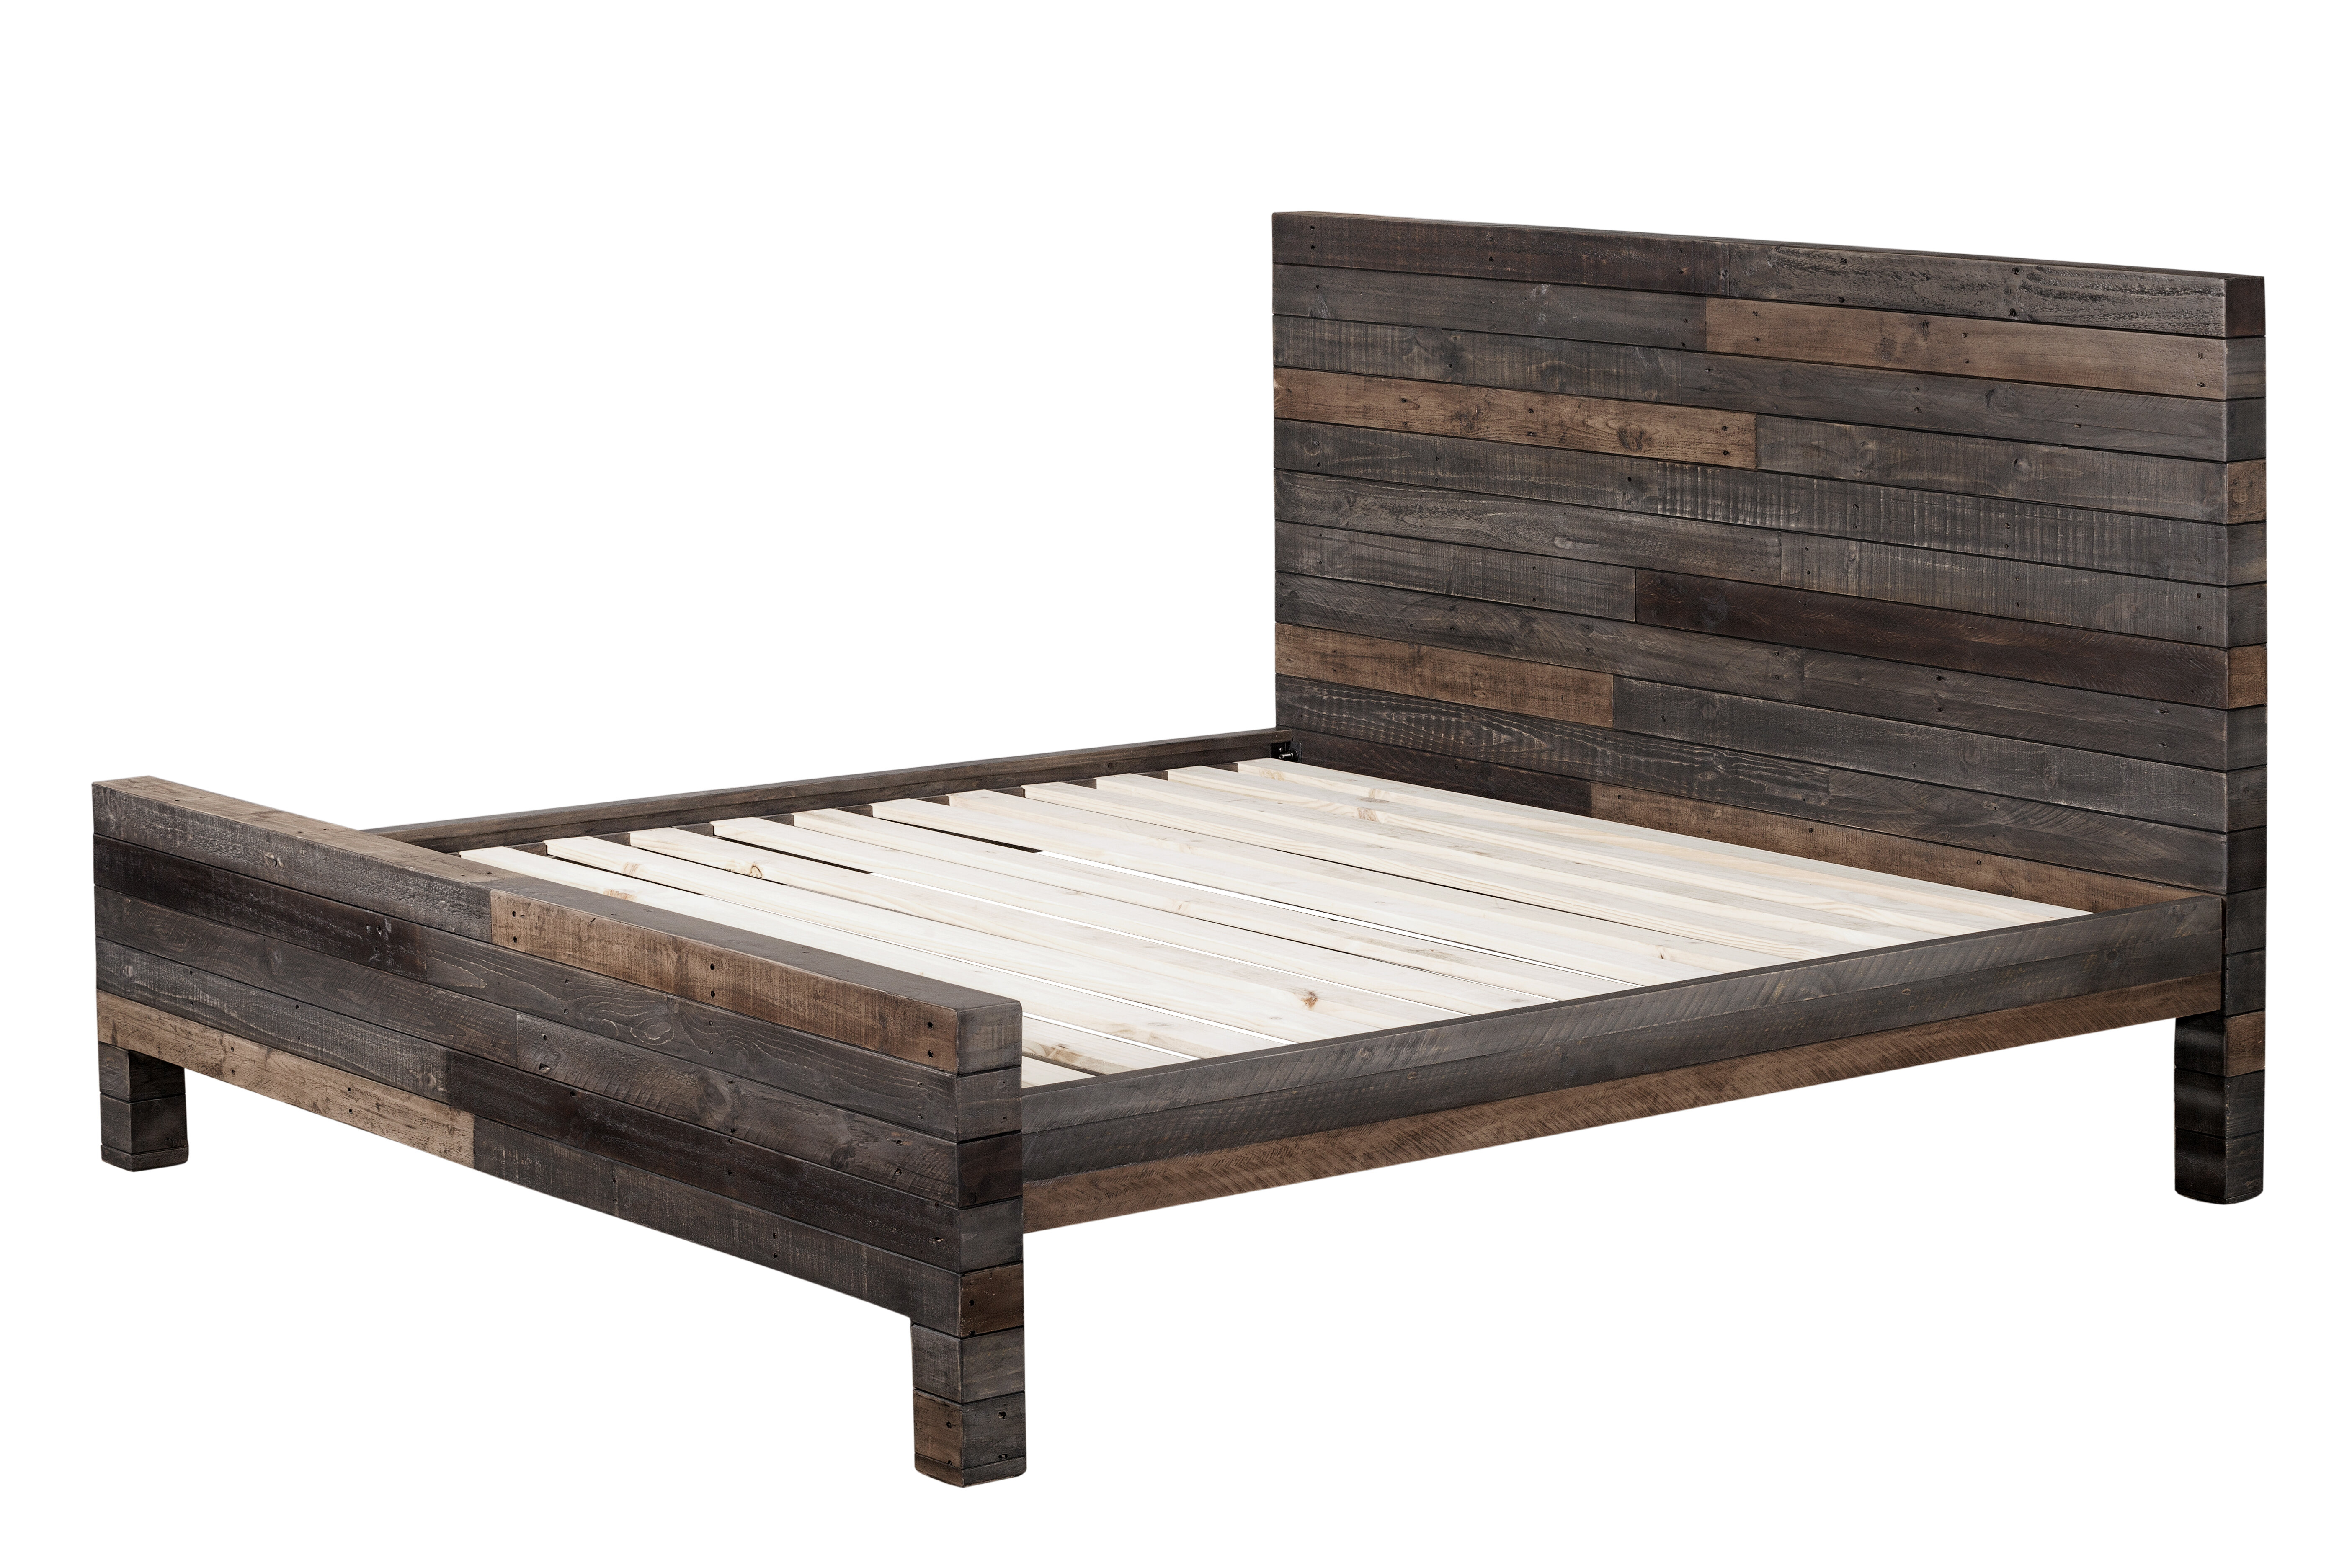 laurel foundry modern farmhouse isabelle california king panel bed wayfair - King Panel Bed